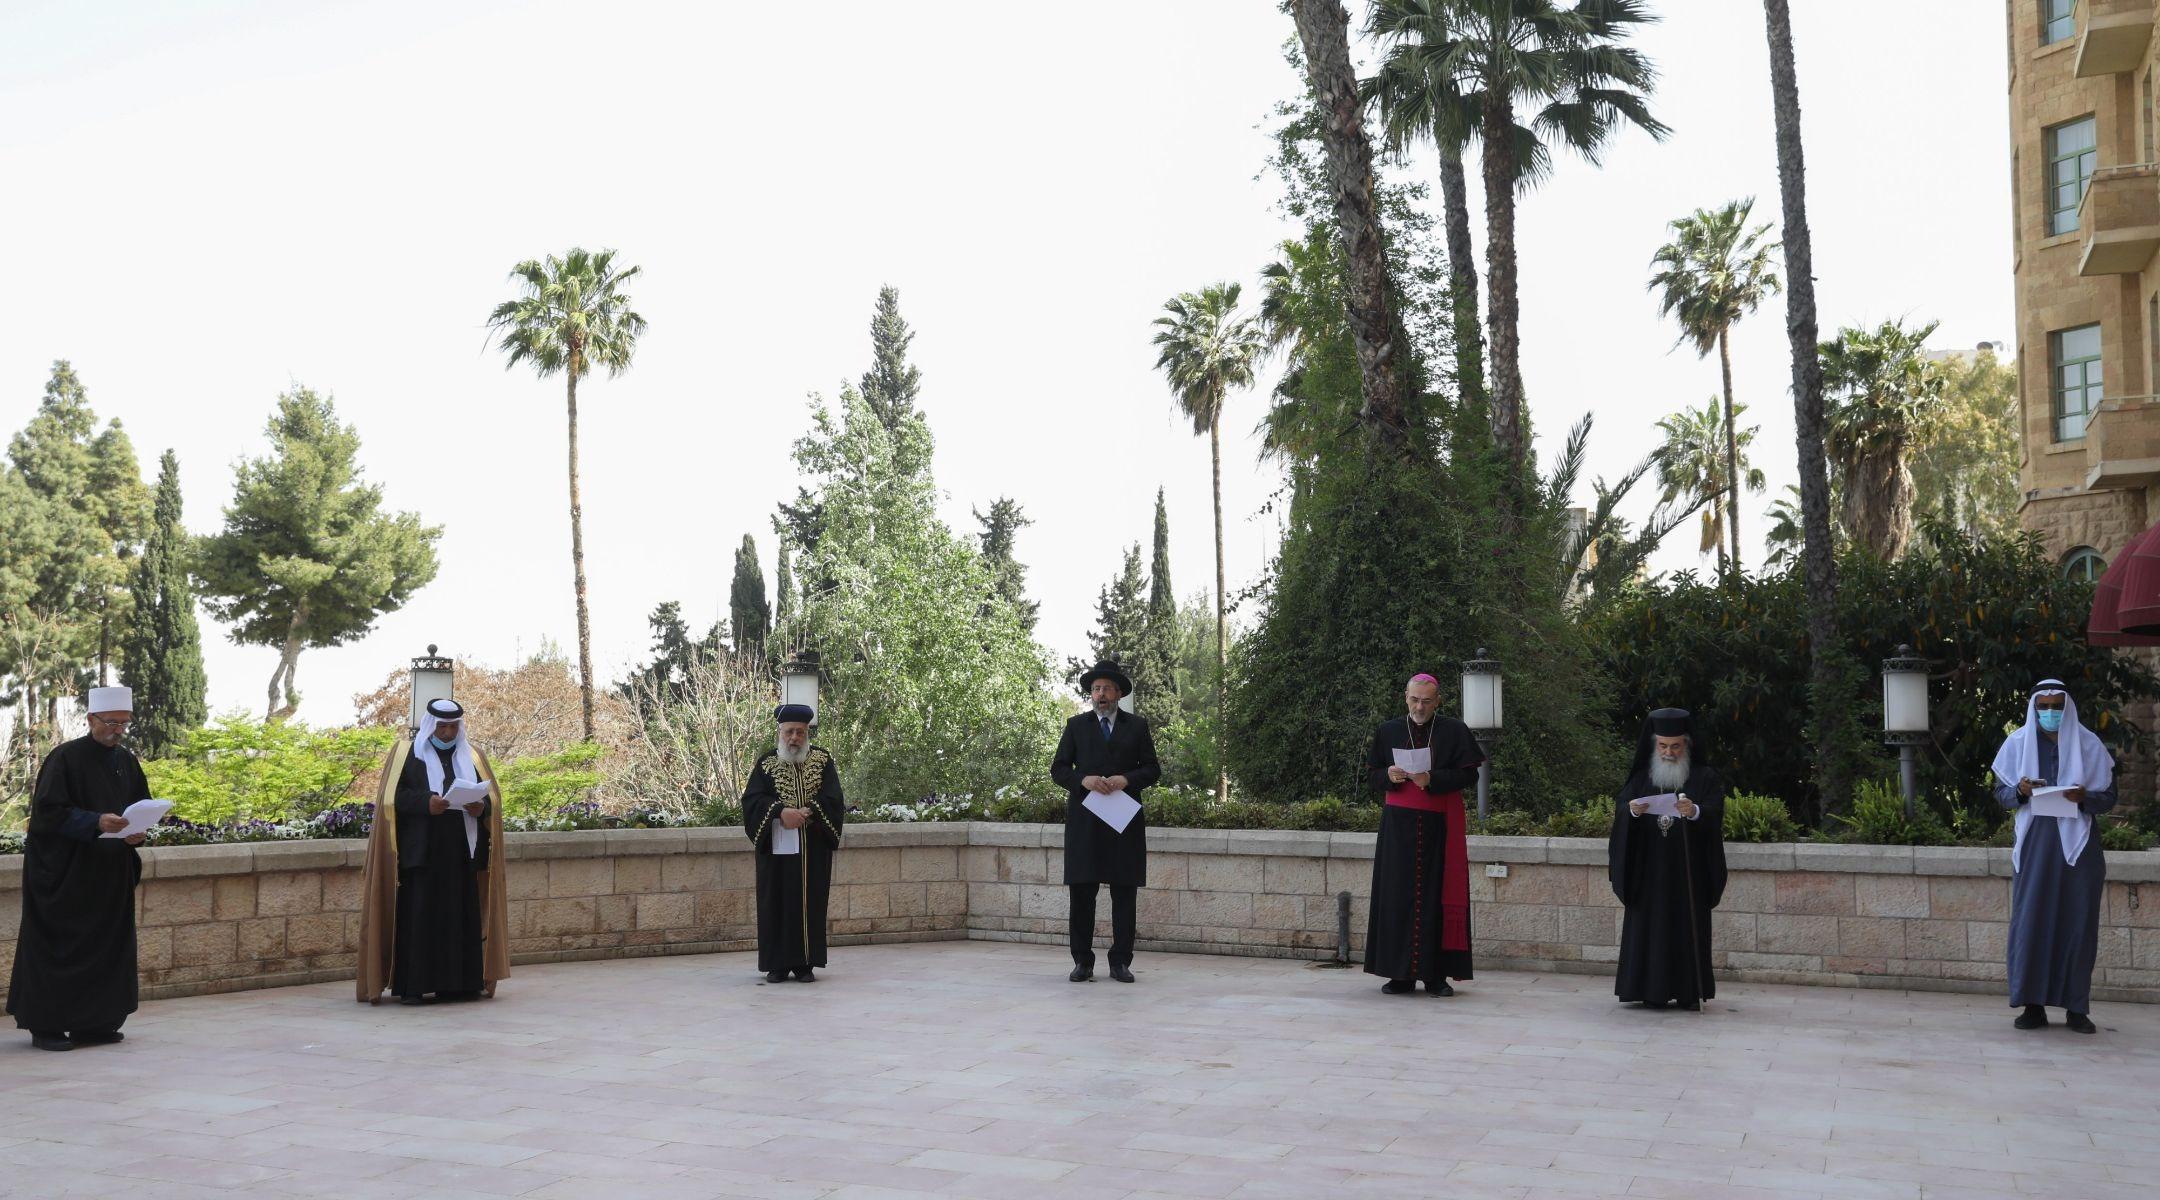 Religious leaders in Jerusalem recite joint prayer composed for the coronavirus